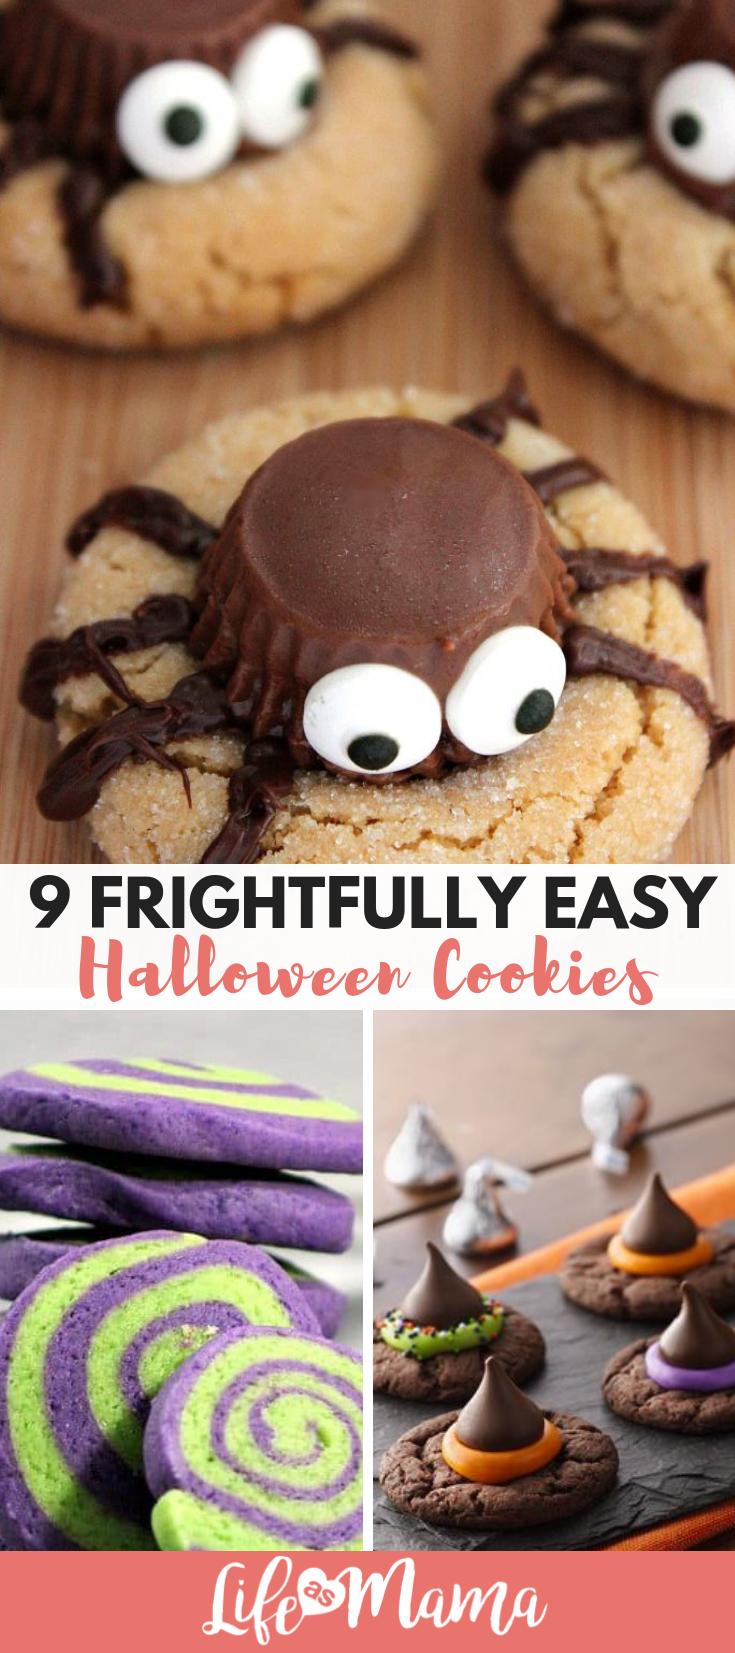 9 frightfully easy halloween cookies   mama's heart   pinterest